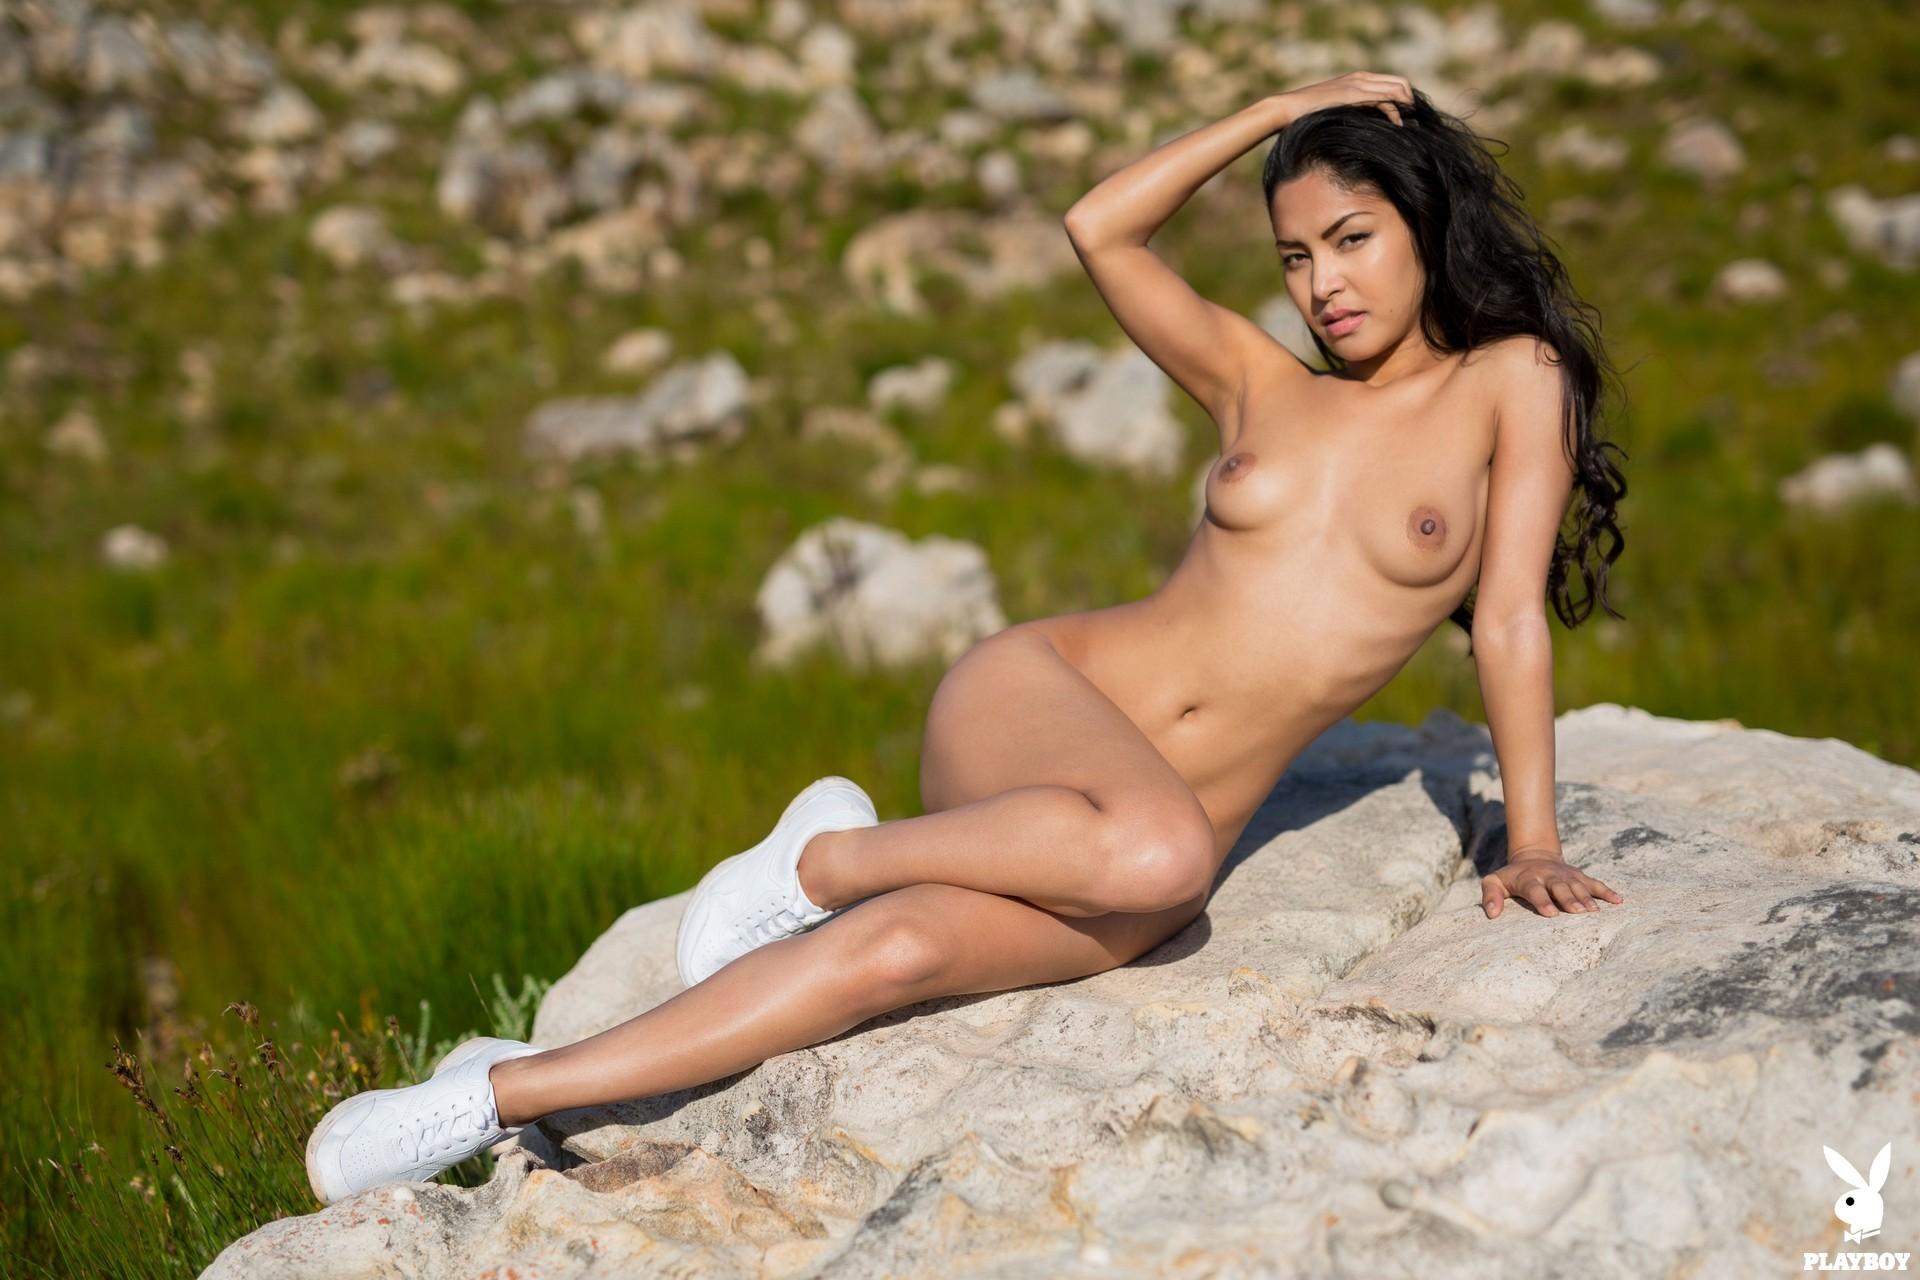 Chloe Rose in Trail Blazing 25